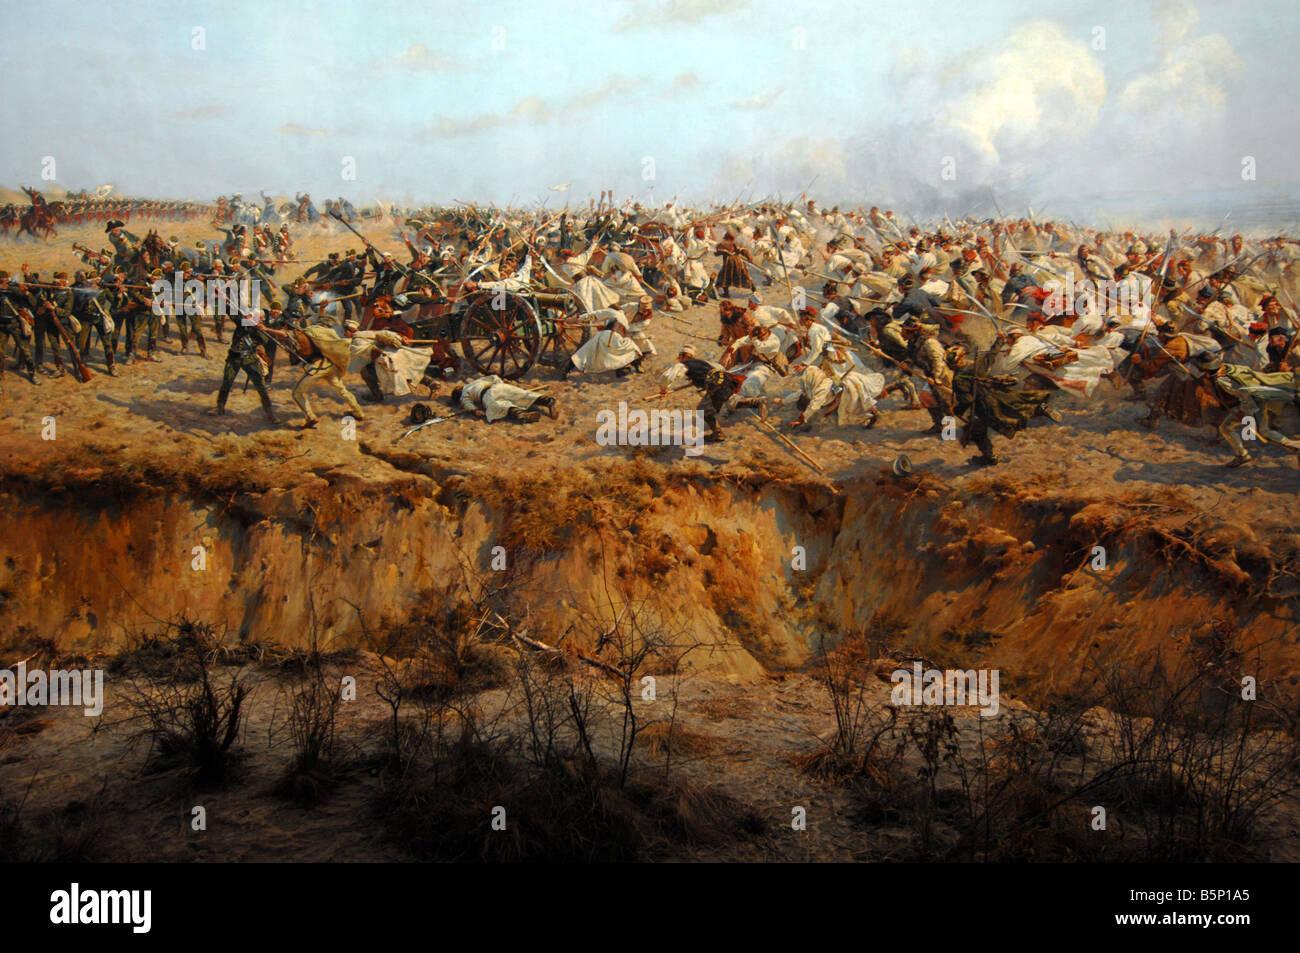 Raclawice Panorama oder Panorama Raclawicka, Panorama-Gemälde, Wroclaw, Polen Stockbild